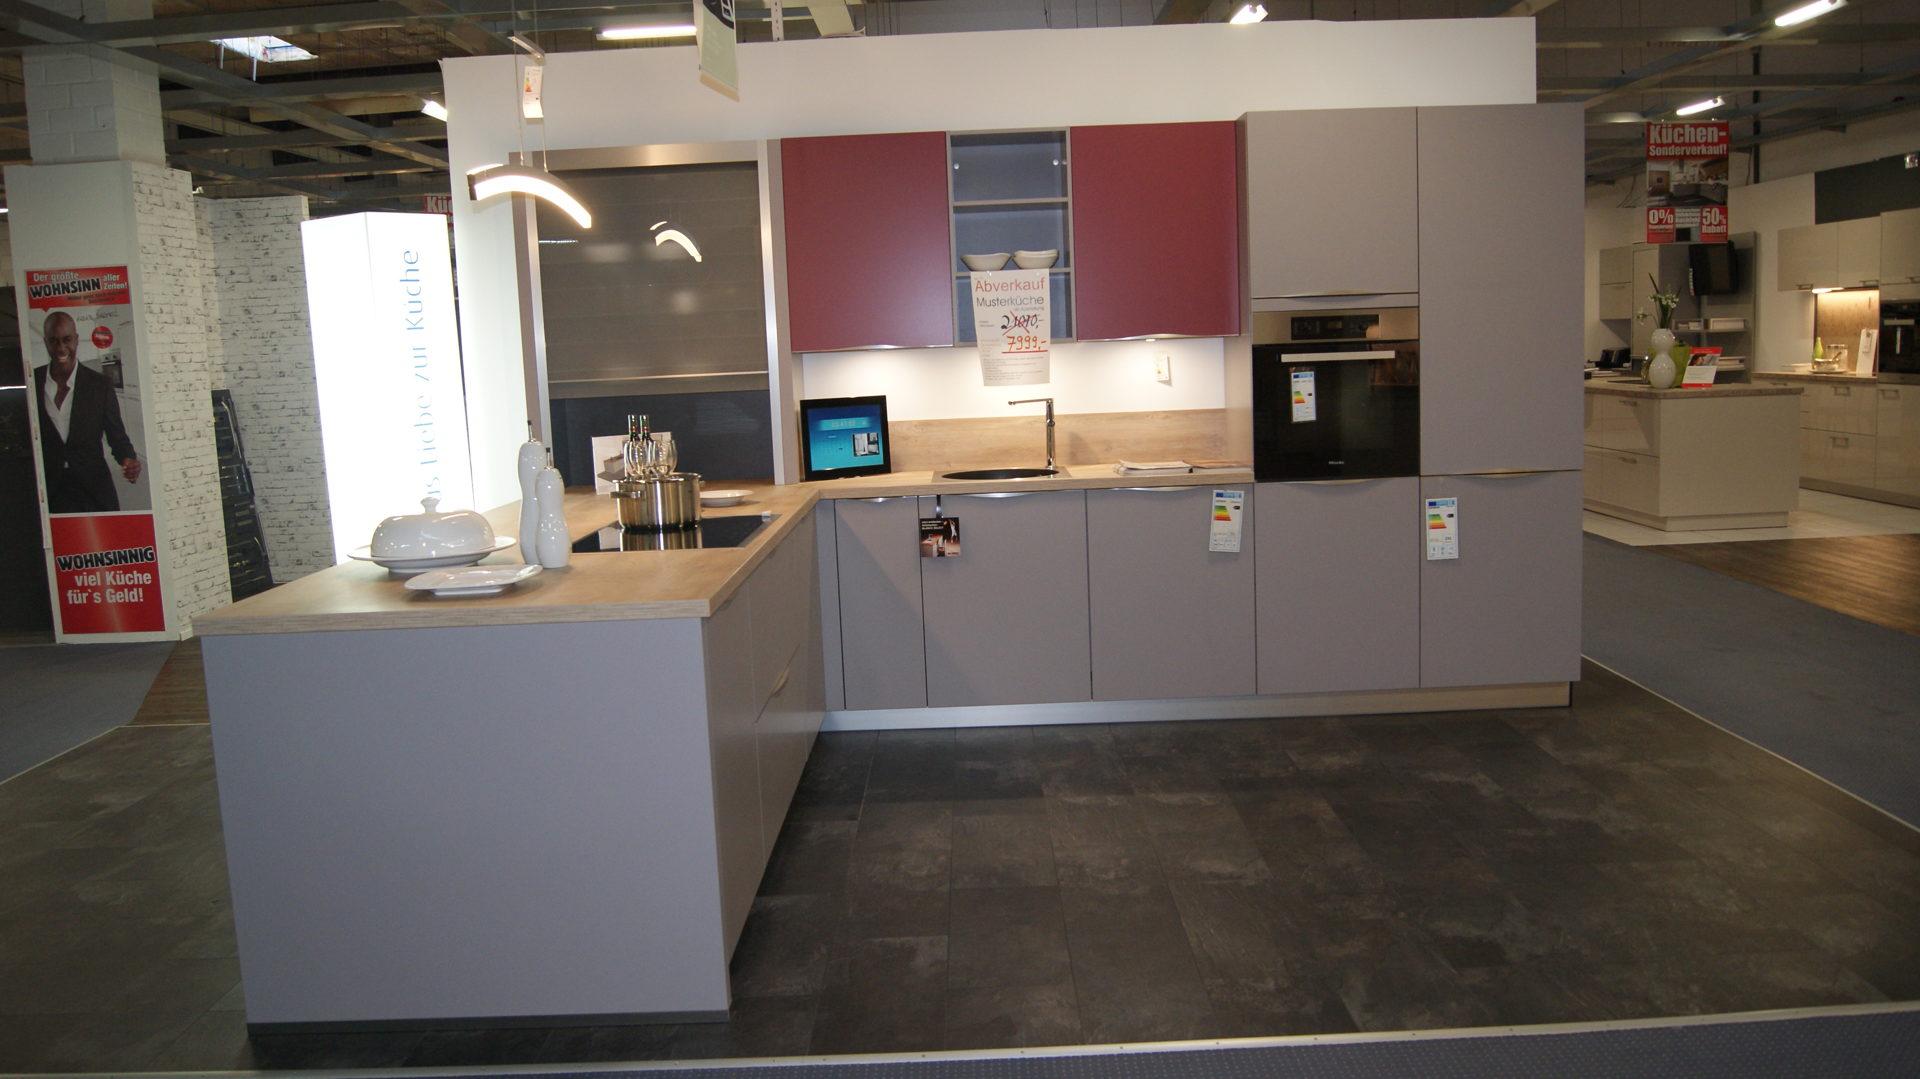 K che Wellmann - Home Design Ideas